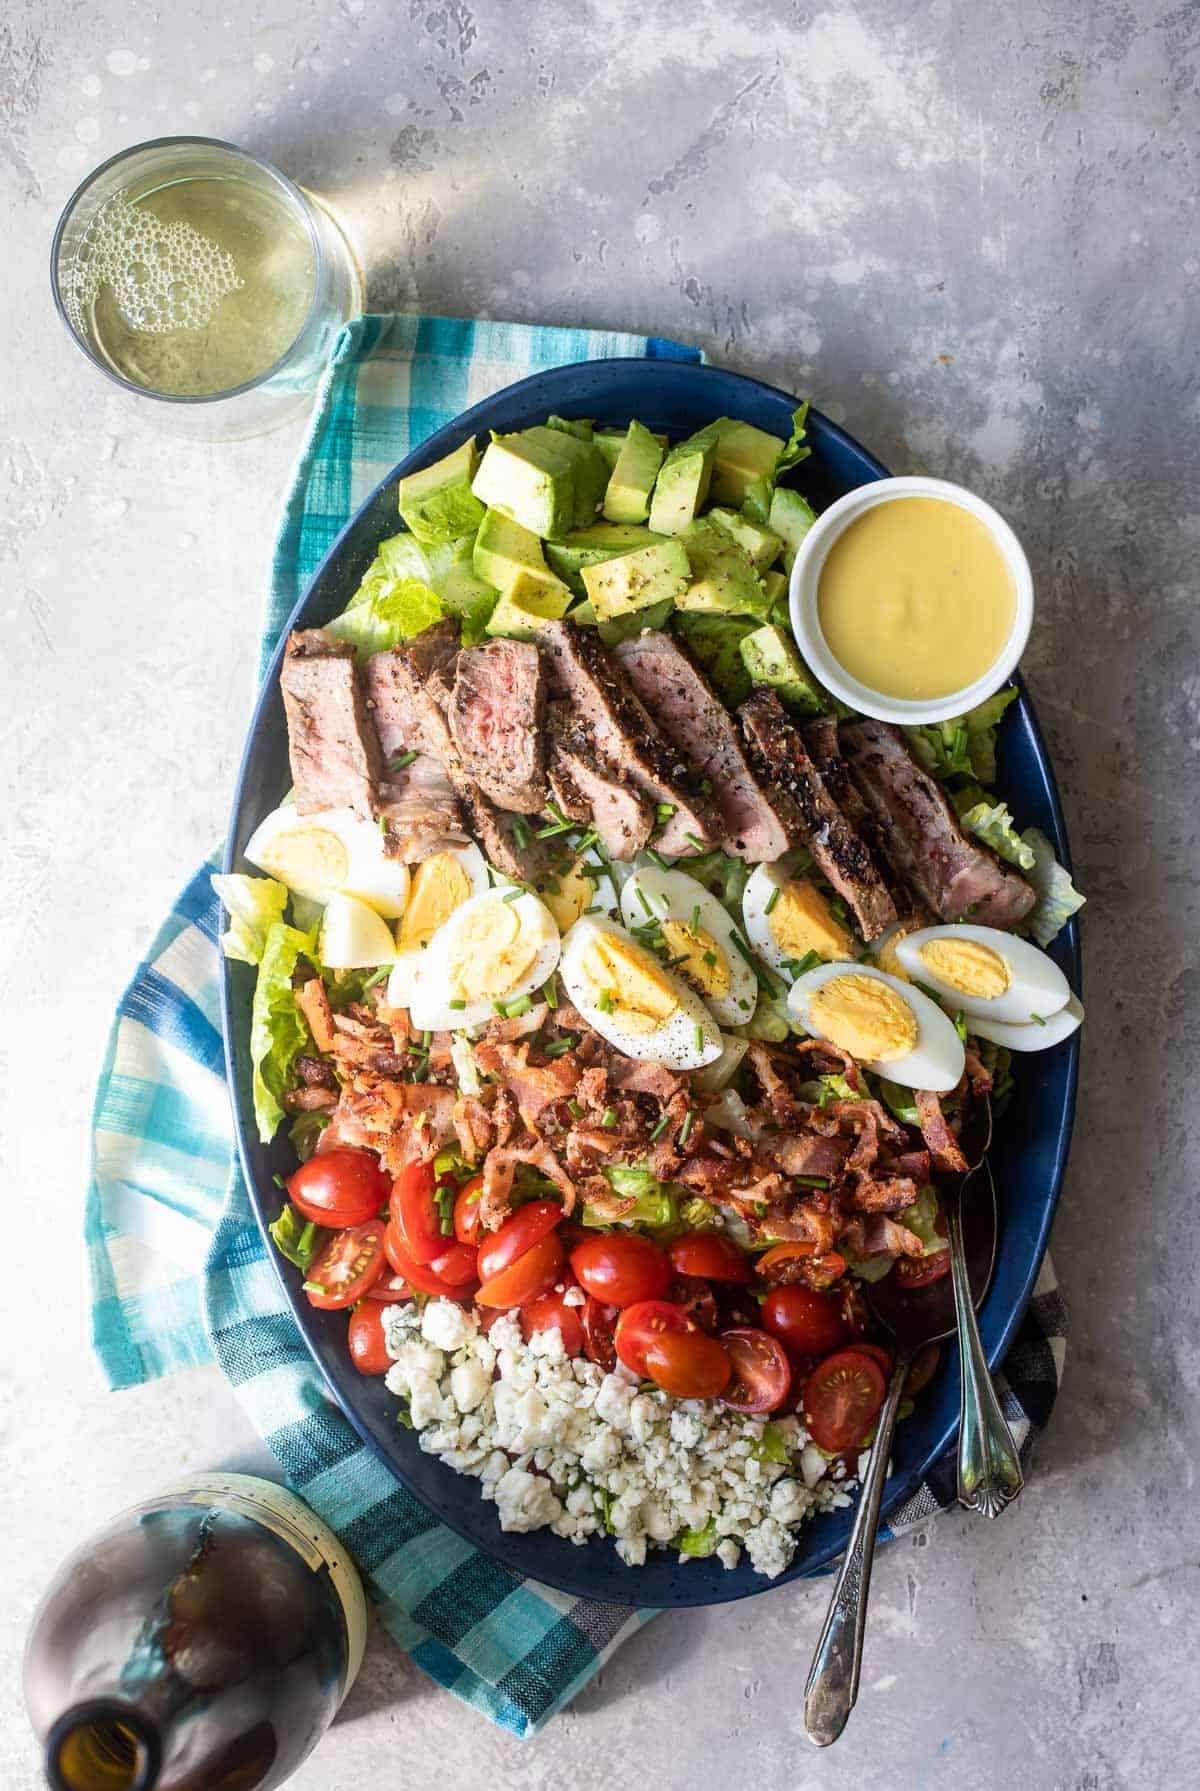 steak cobb salad on a plate